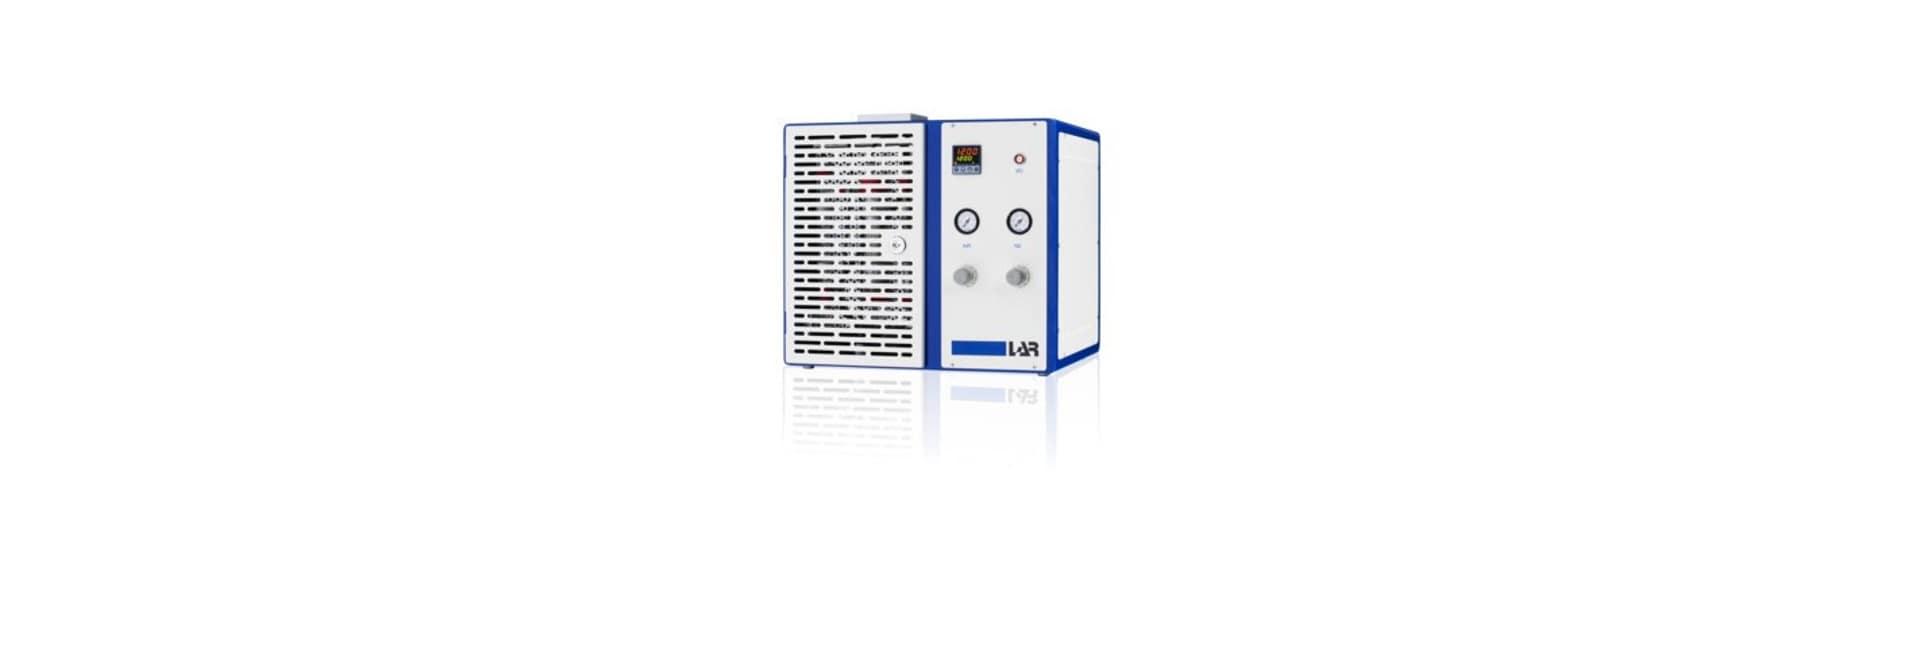 LAR's COD analyzer QuickCODlab for laboratories.